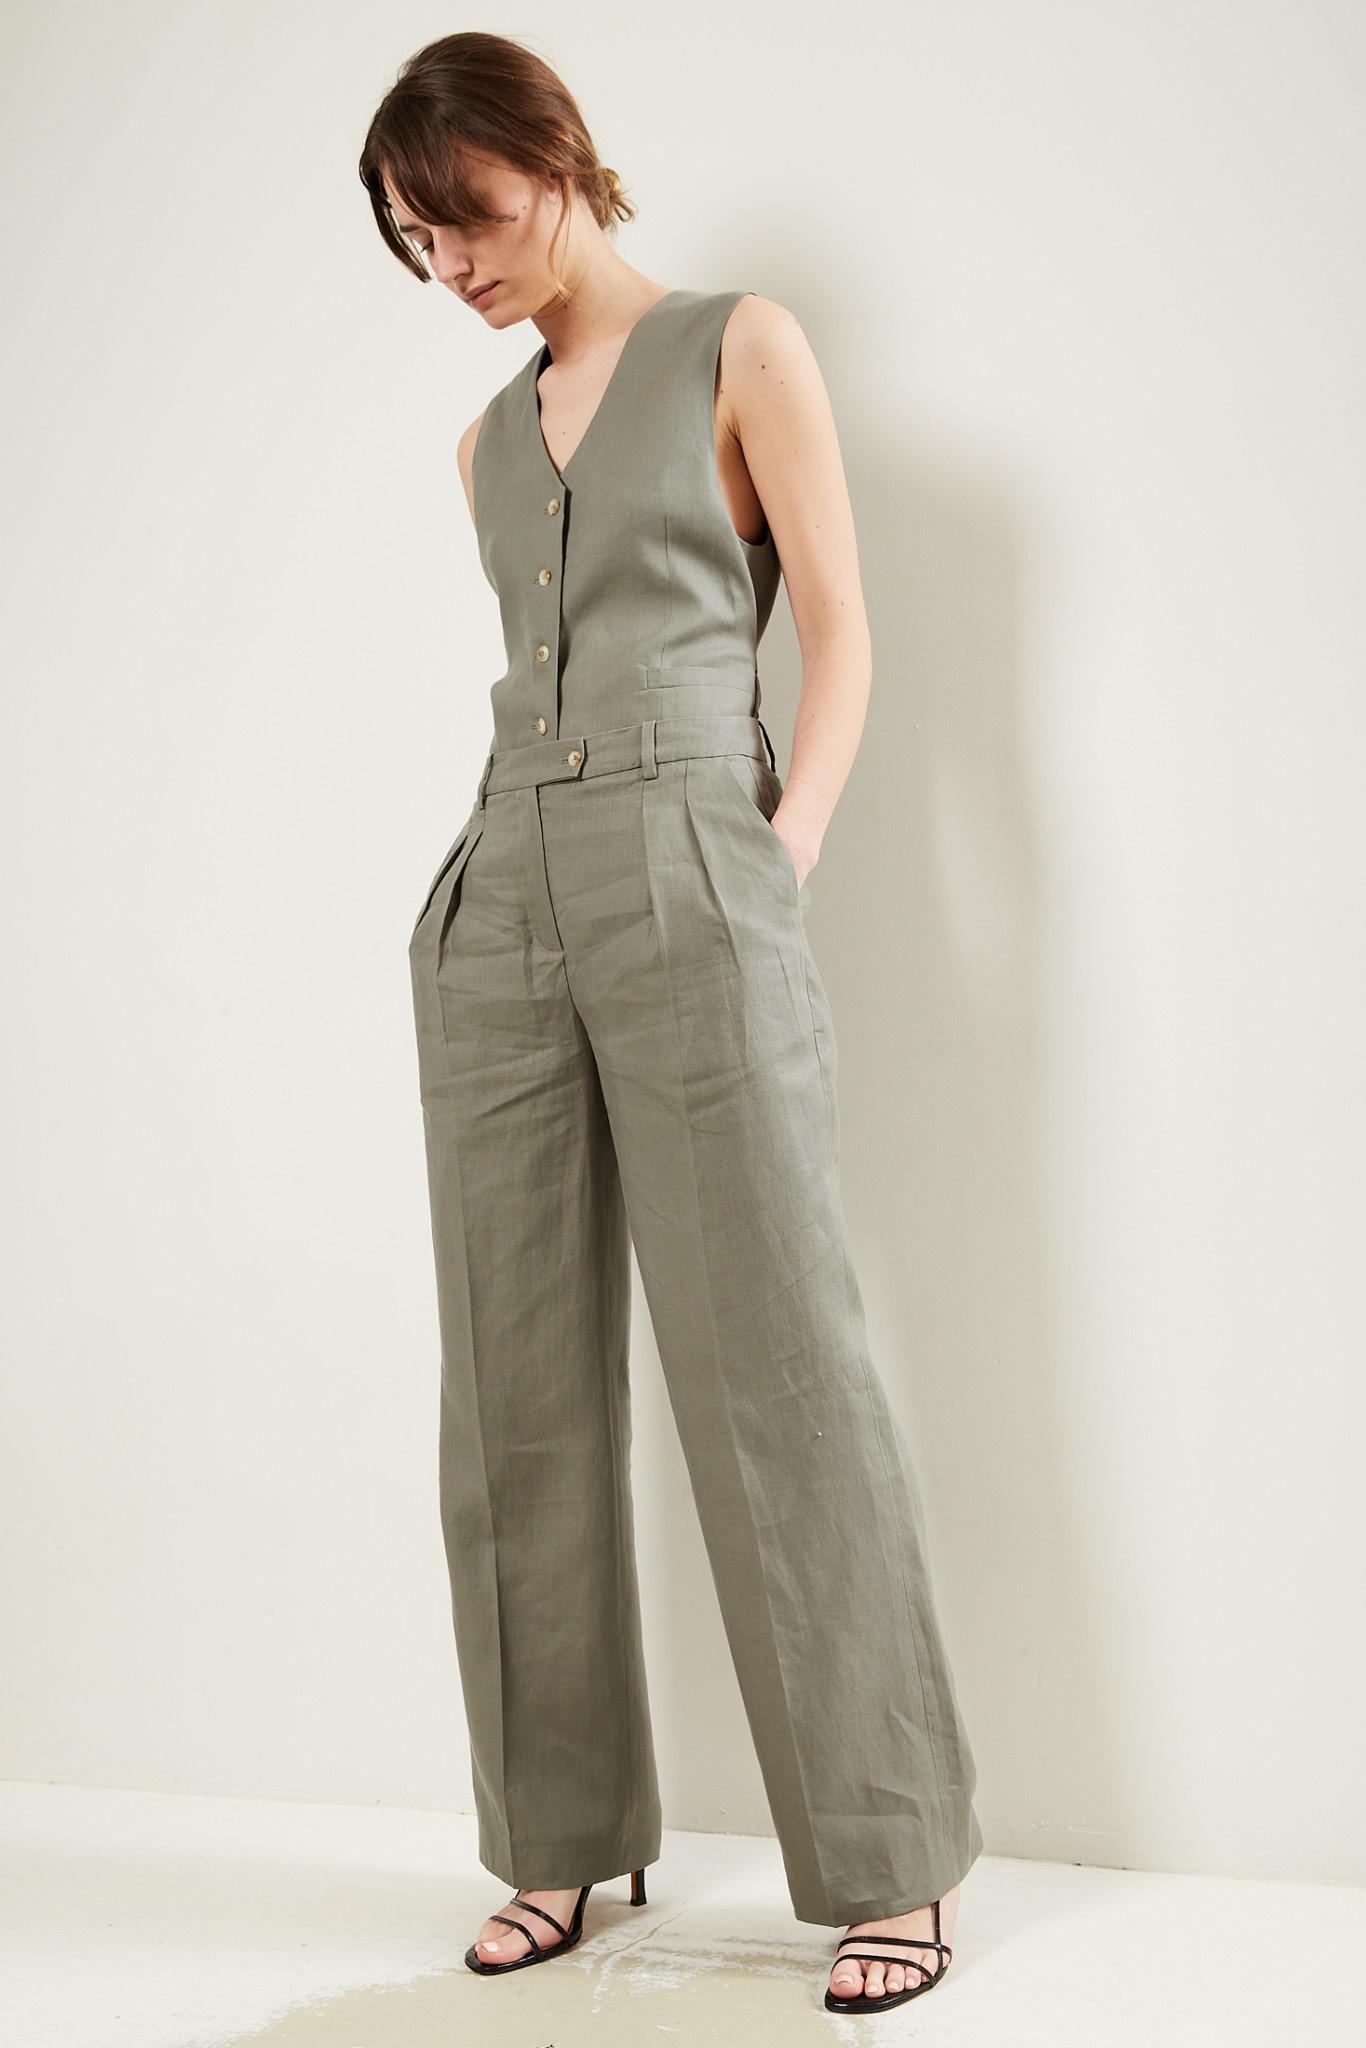 loulou studio Bidong linen pants